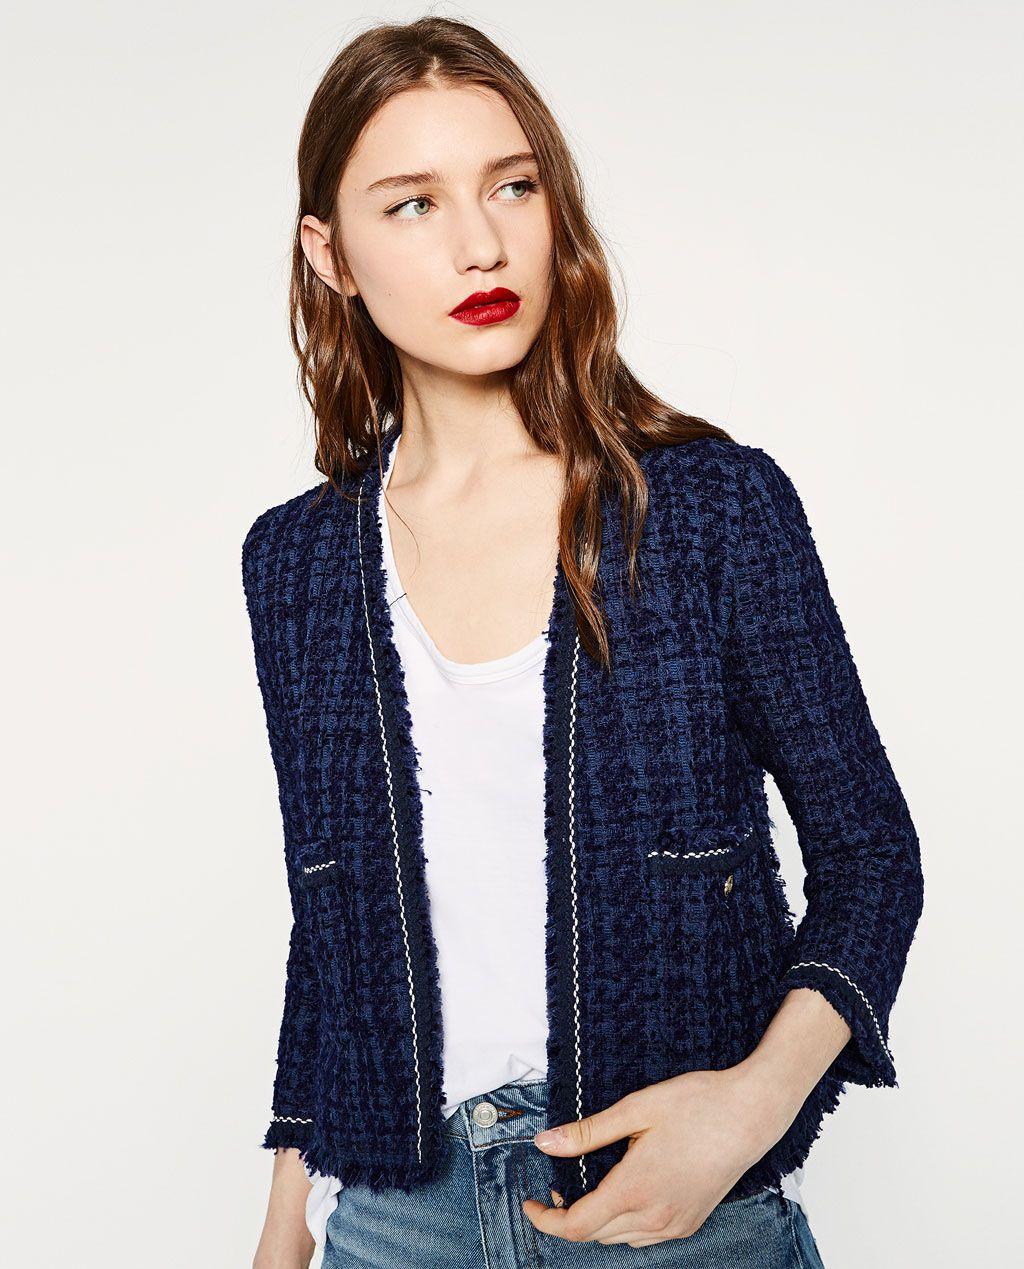 tweed jacket blazers woman zara united states fashion pinterest tweed jackets zara. Black Bedroom Furniture Sets. Home Design Ideas